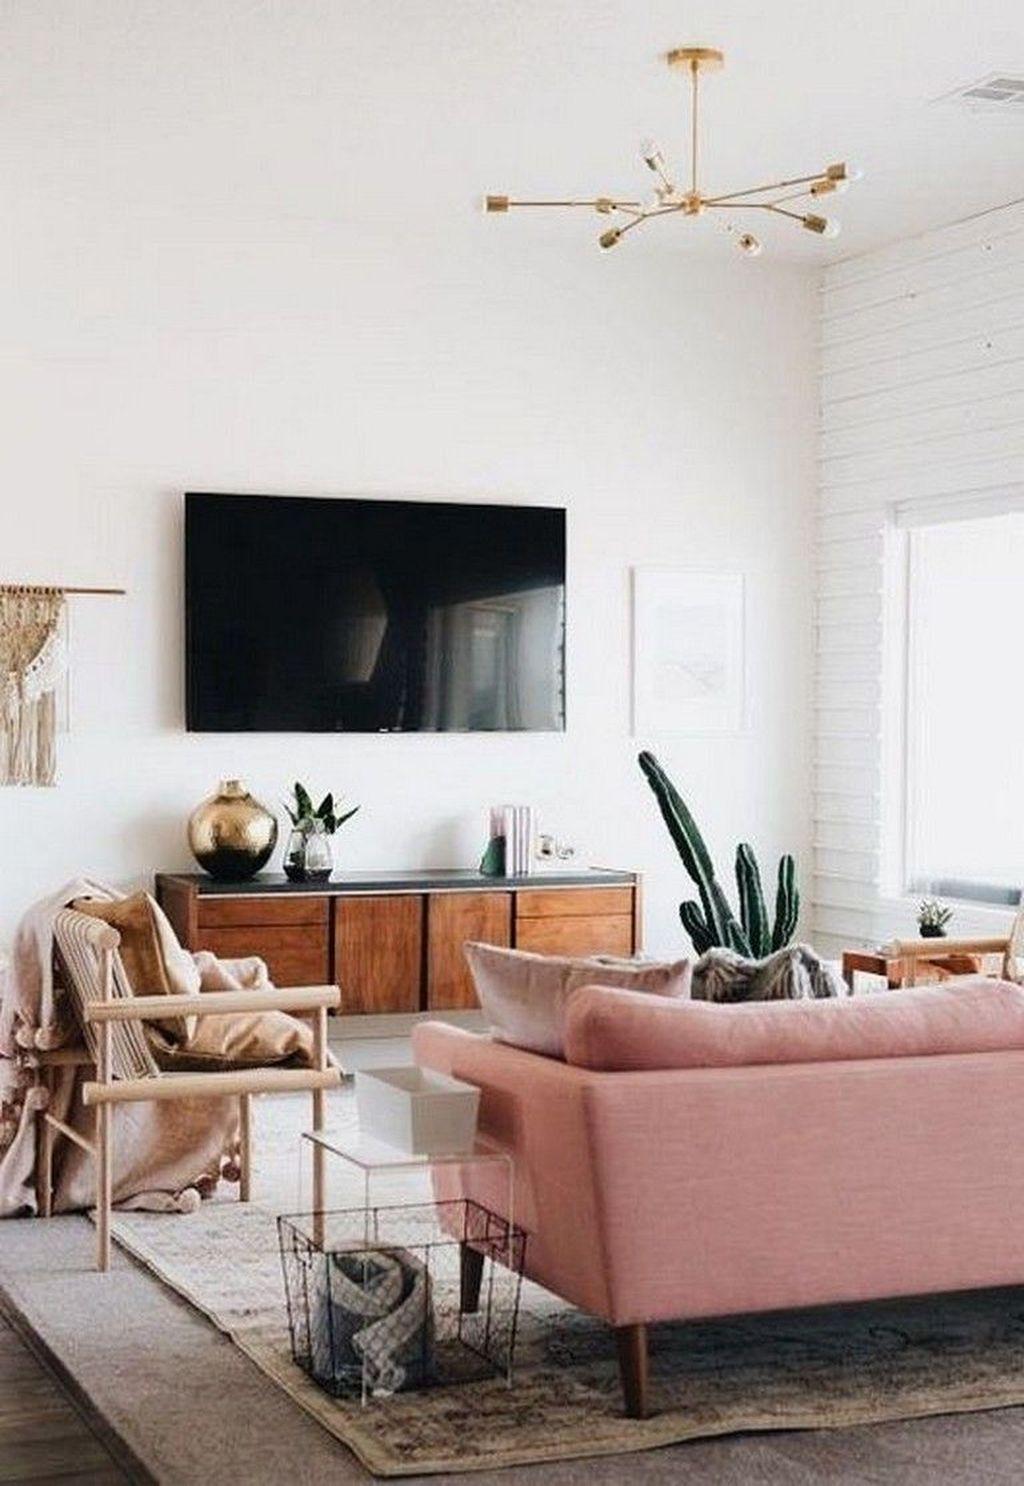 Inspiring Small Living Room Decor Ideas 14